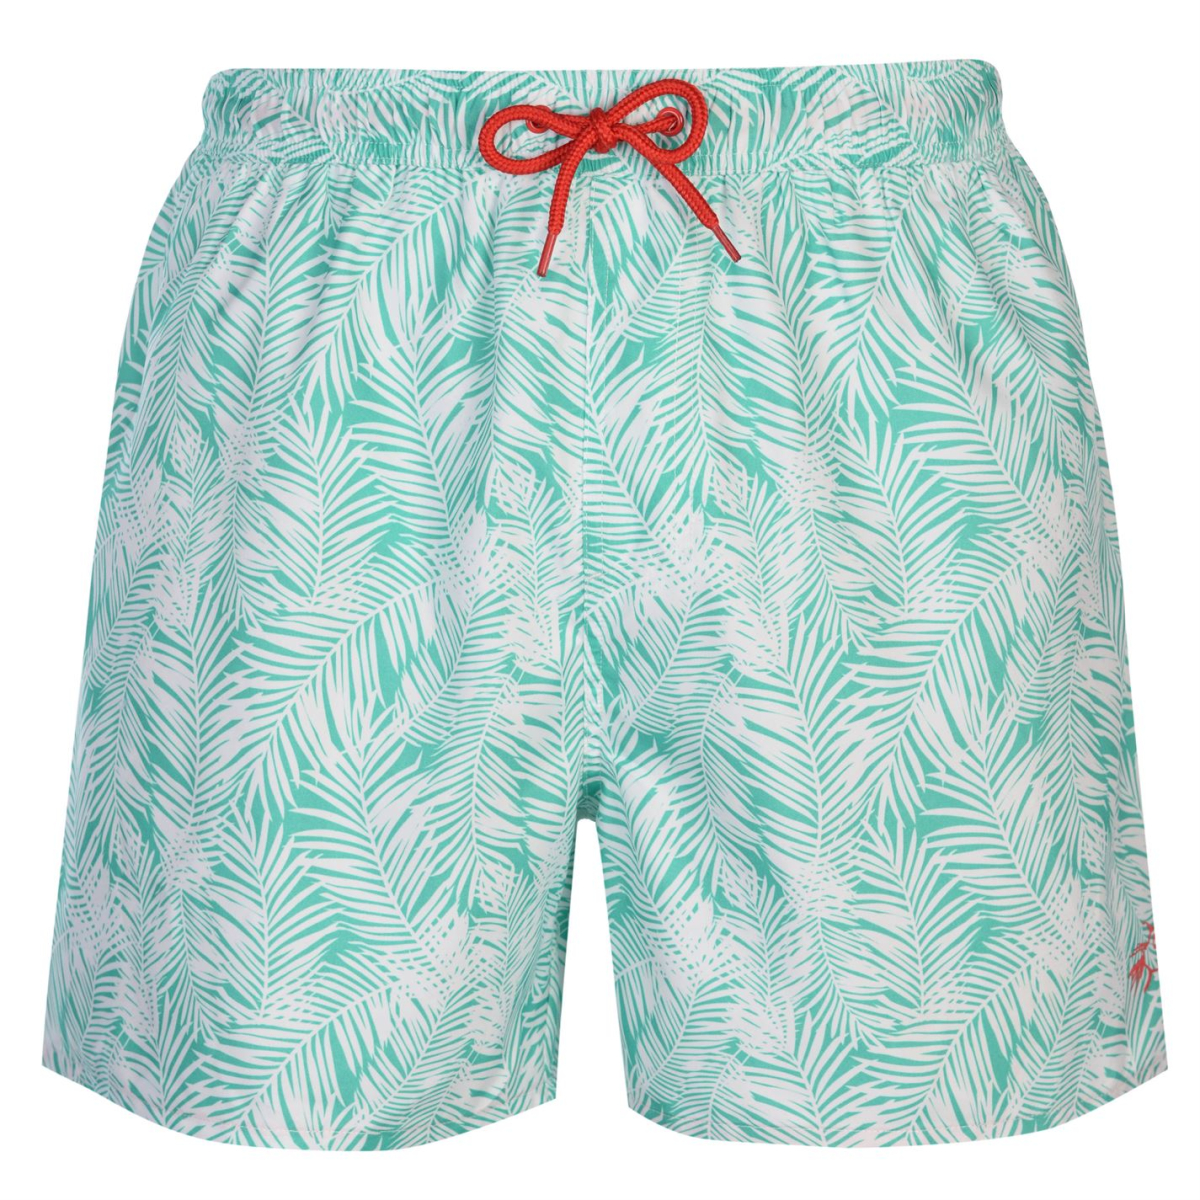 Hot Tuna Oasis Shorts Herren Grün_Weiß